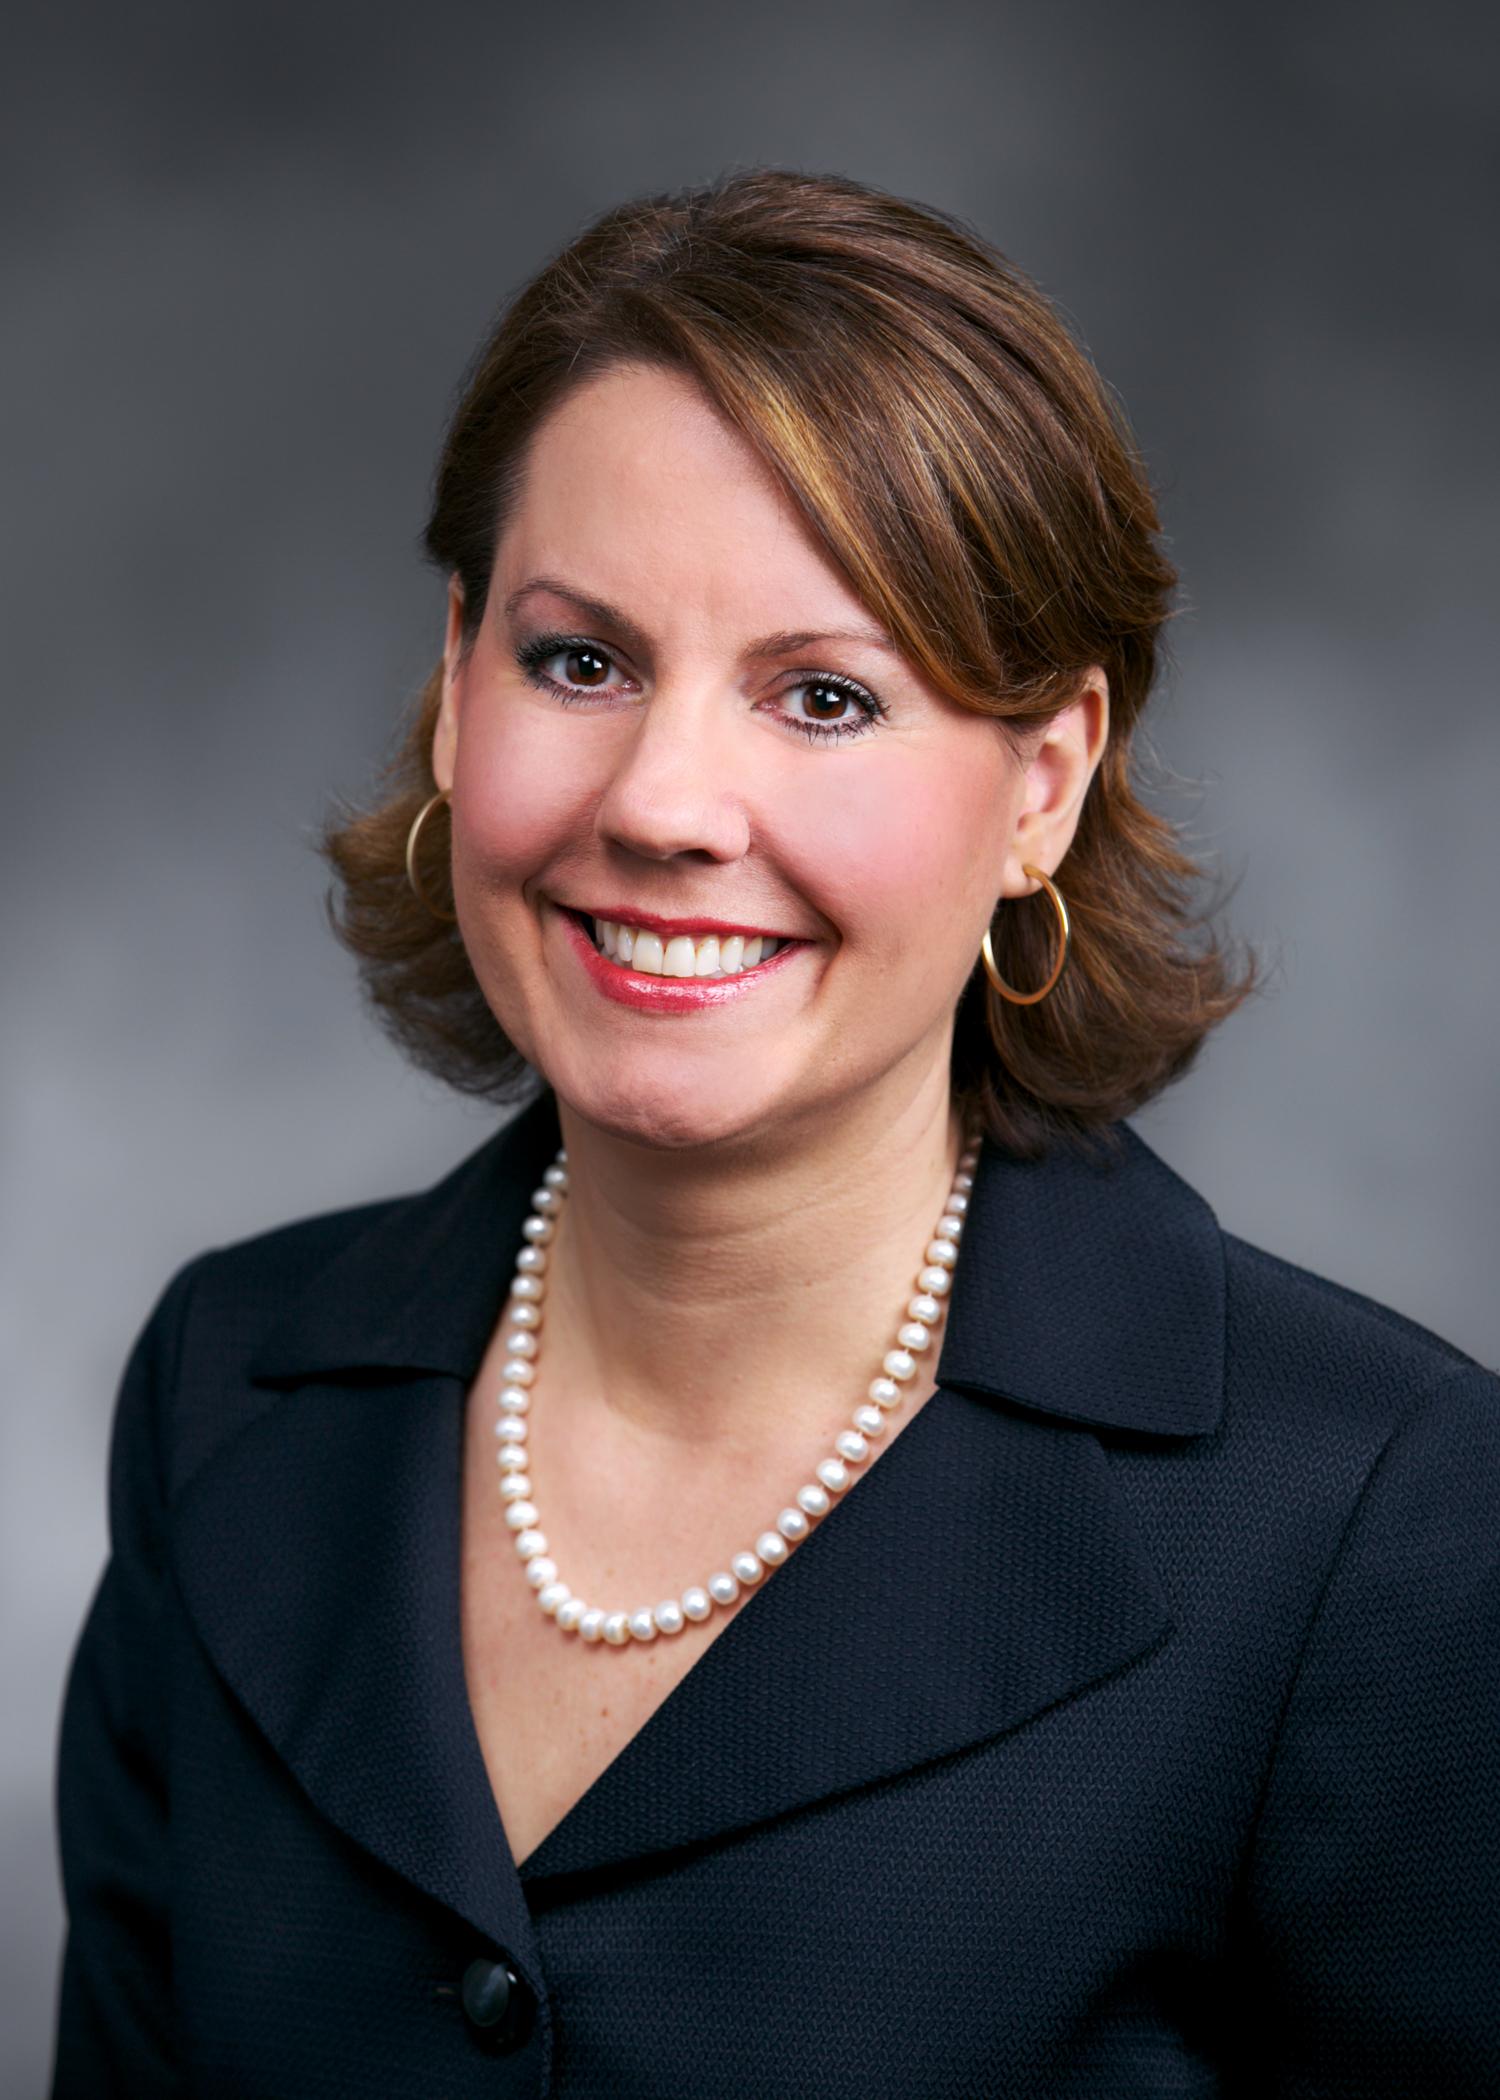 State Senator Ann Rivers